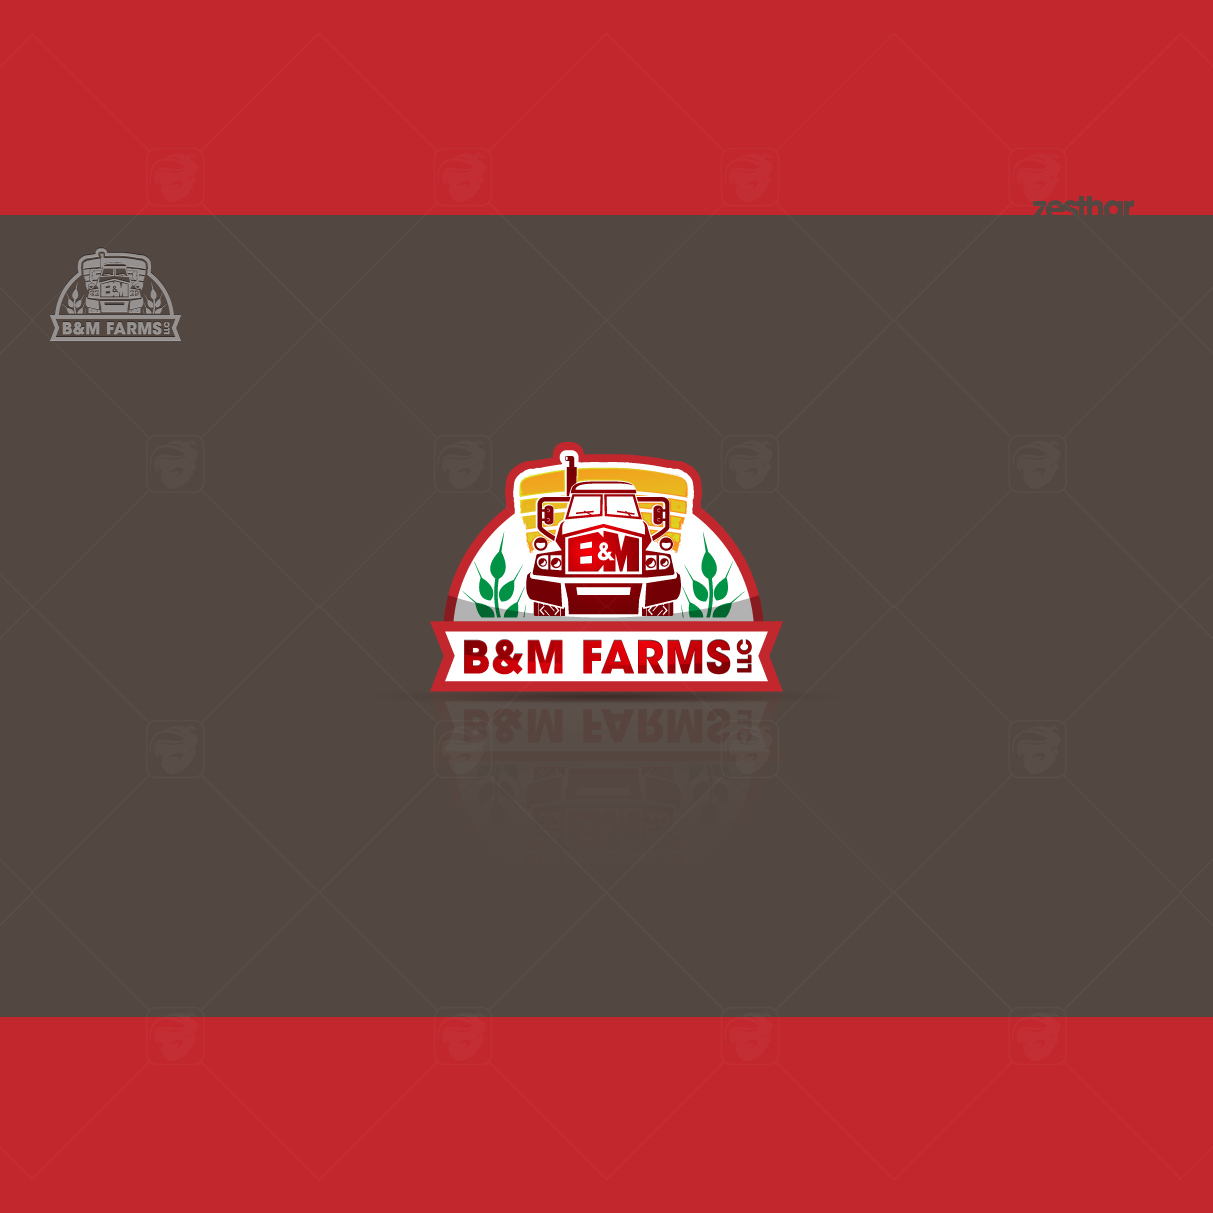 Logo Design by zesthar - Entry No. 48 in the Logo Design Contest Creative Logo Design for B & M Farms, LLC.